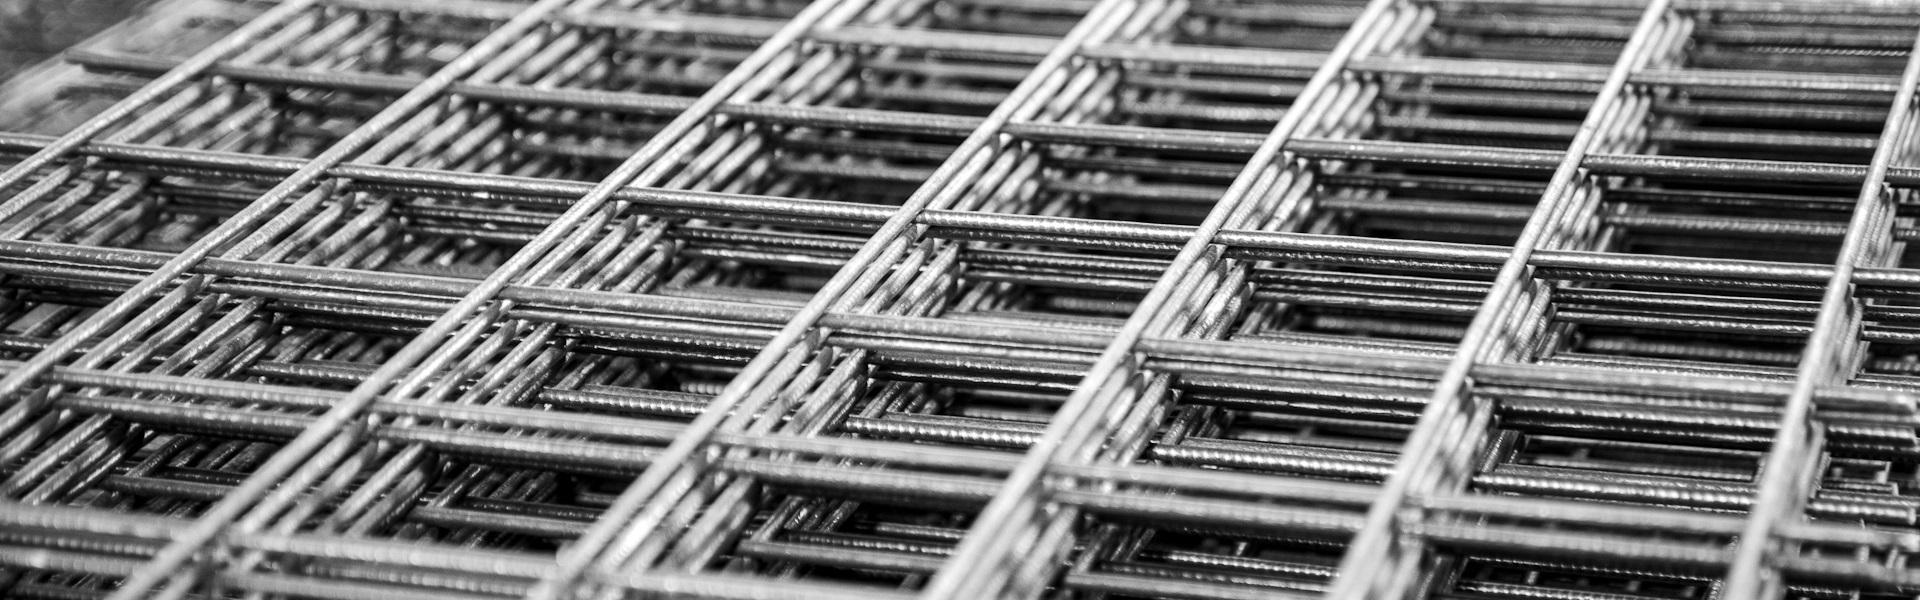 Лидер по продаже металлических сеток